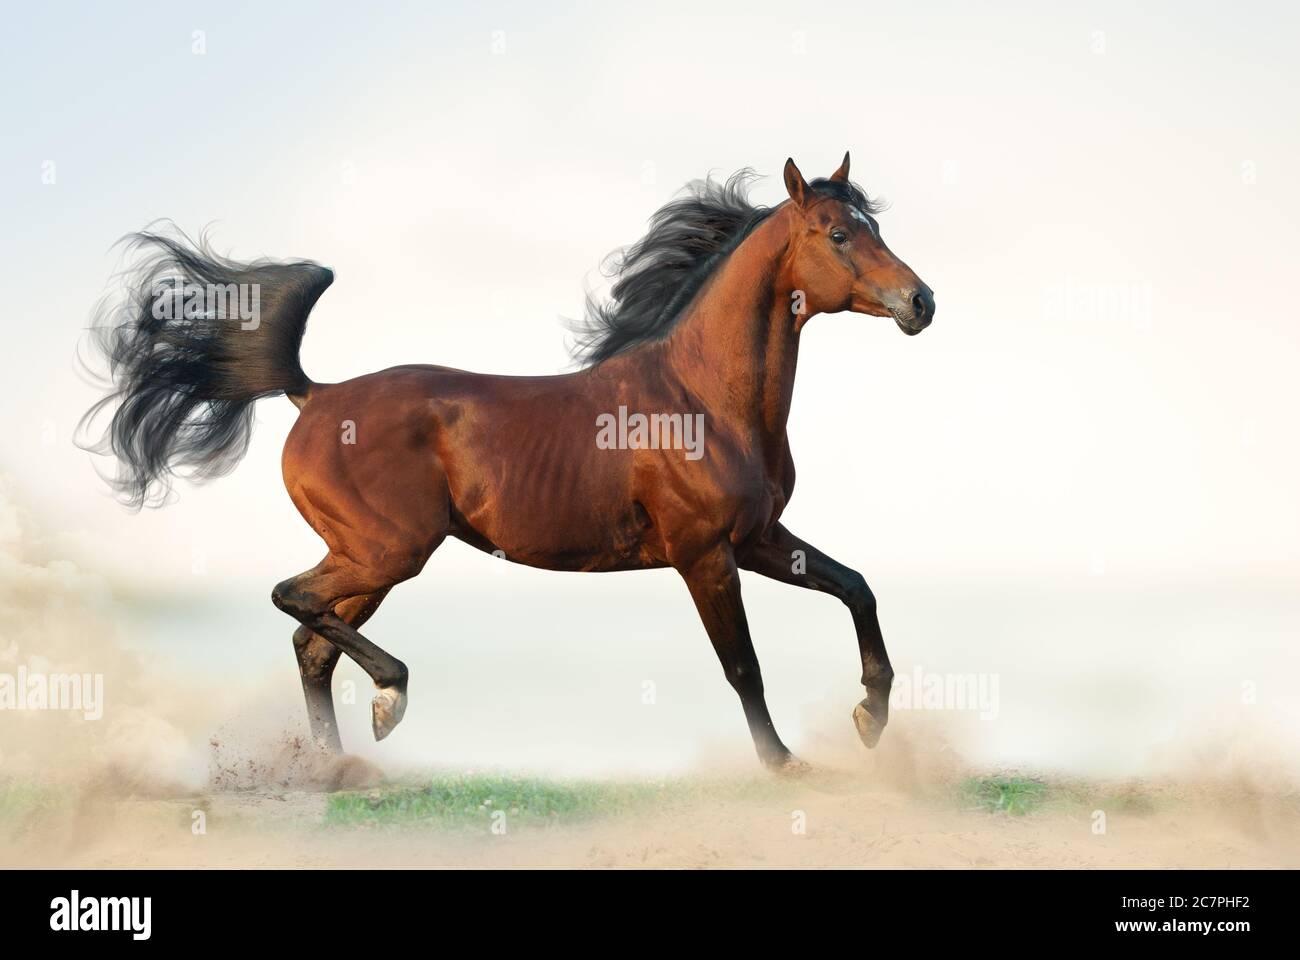 Beautiful Bay Arabian Stallion On Freedom Arab Horse Running On Freedom On The Wild Bay Arabian Horse On Grass Elegant Arab Stallion Trotting Stock Photo Alamy